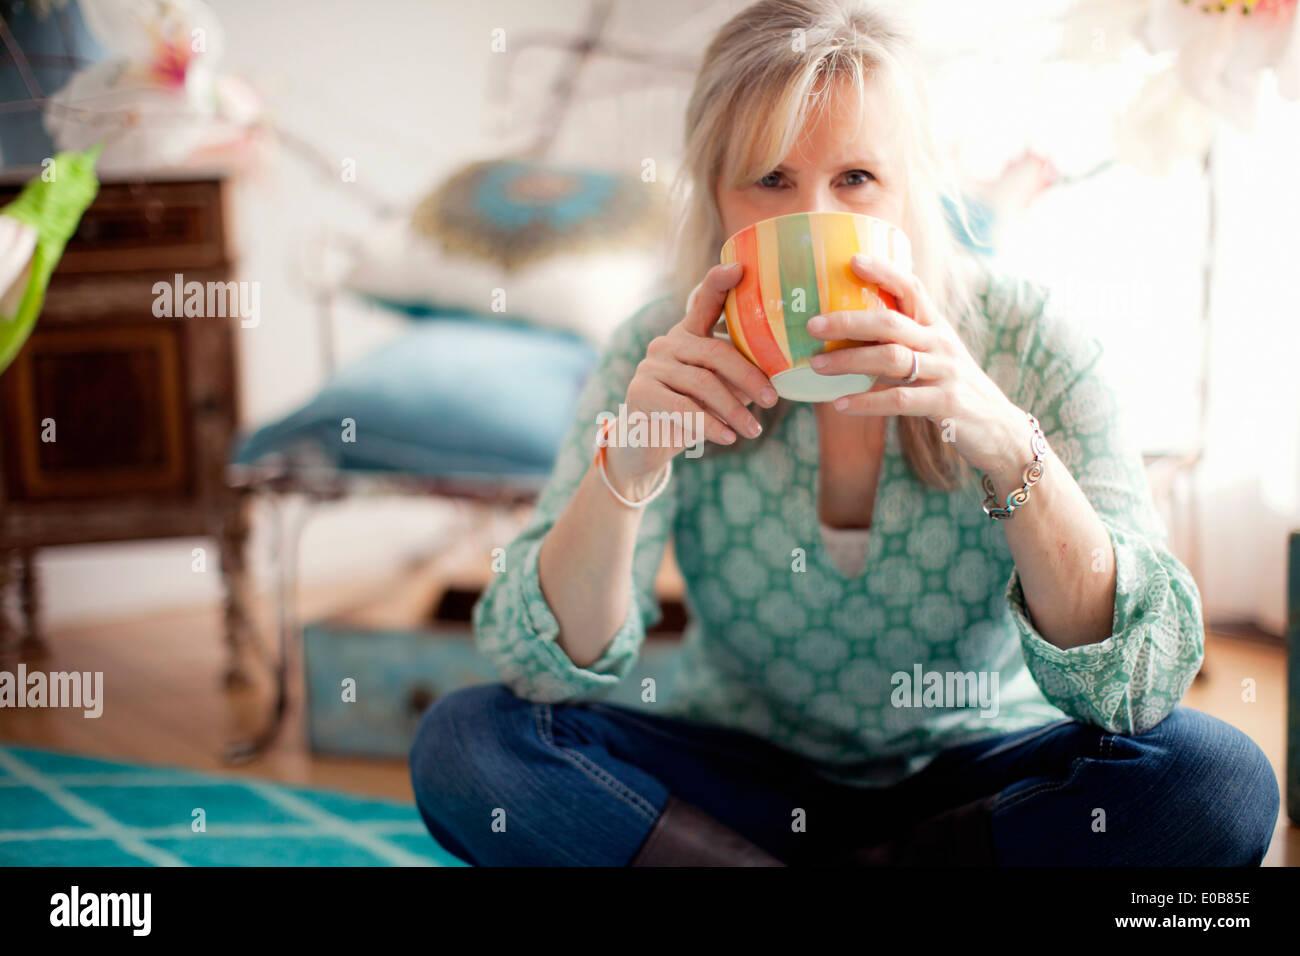 Mature woman sitting cross legged drinking coffee - Stock Image